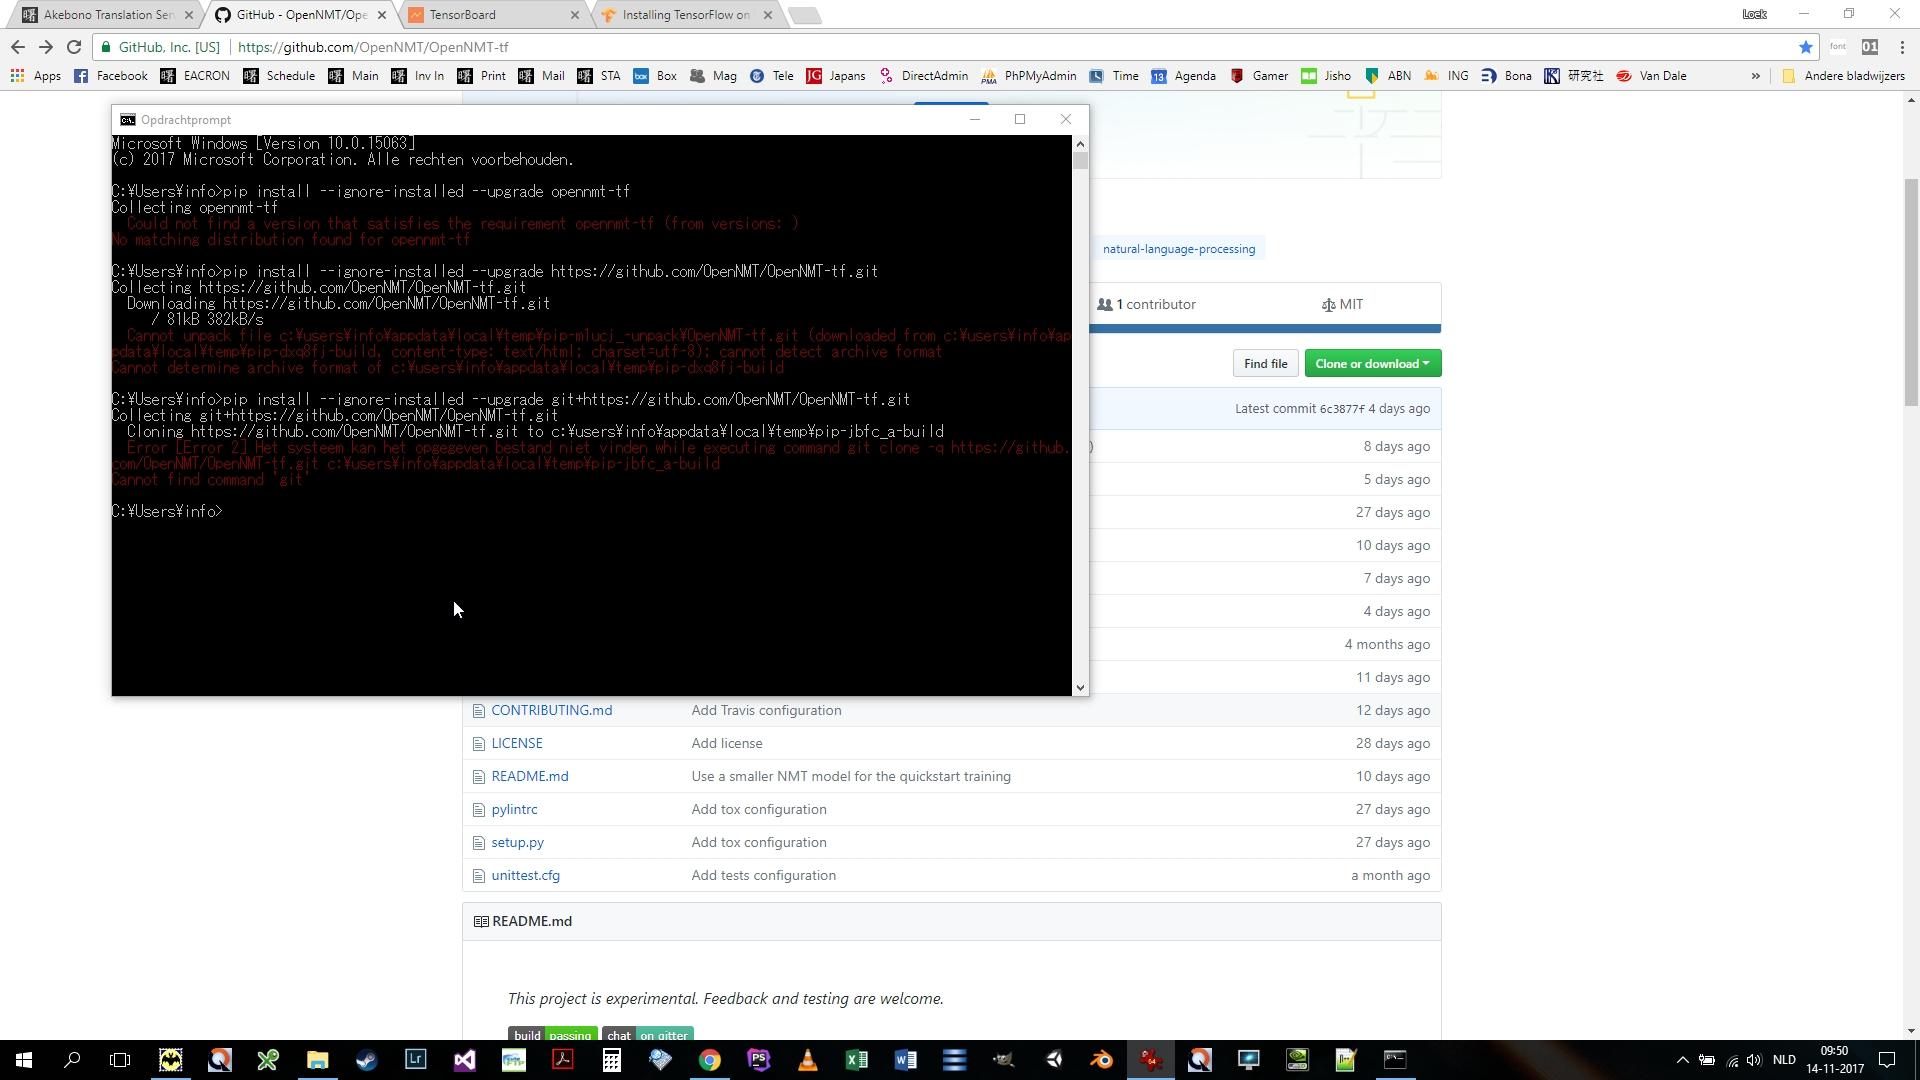 OpenNMT on Python in Windows: Not working - Support - OpenNMT Forum